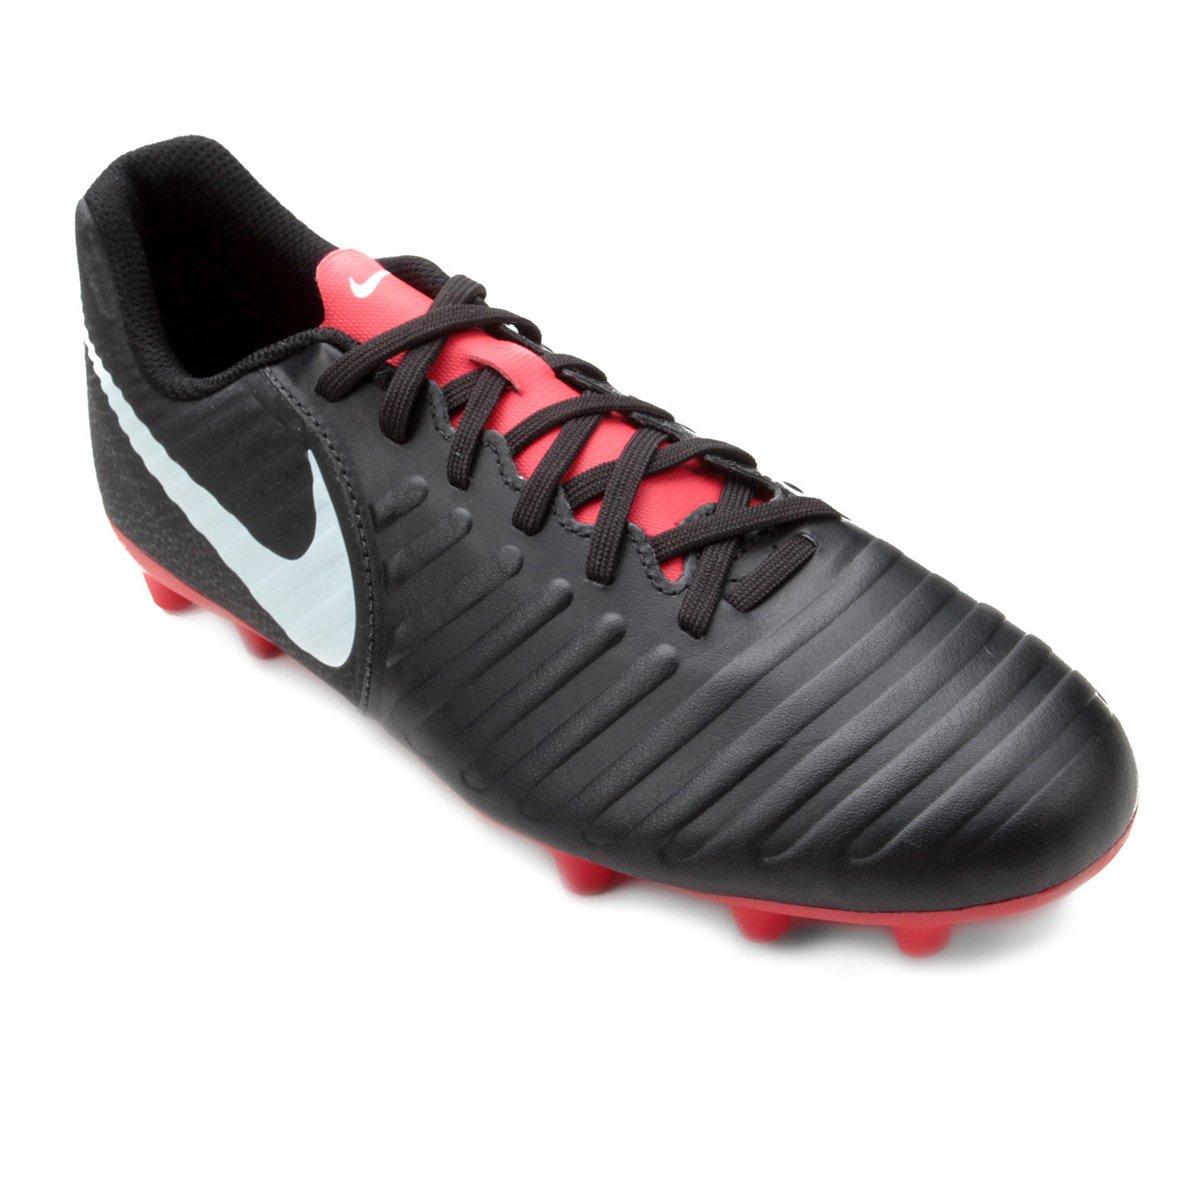 huge discount 1dee8 a157a Chuteira Campo Nike Tiempo Legend 7 Club FG - Preto